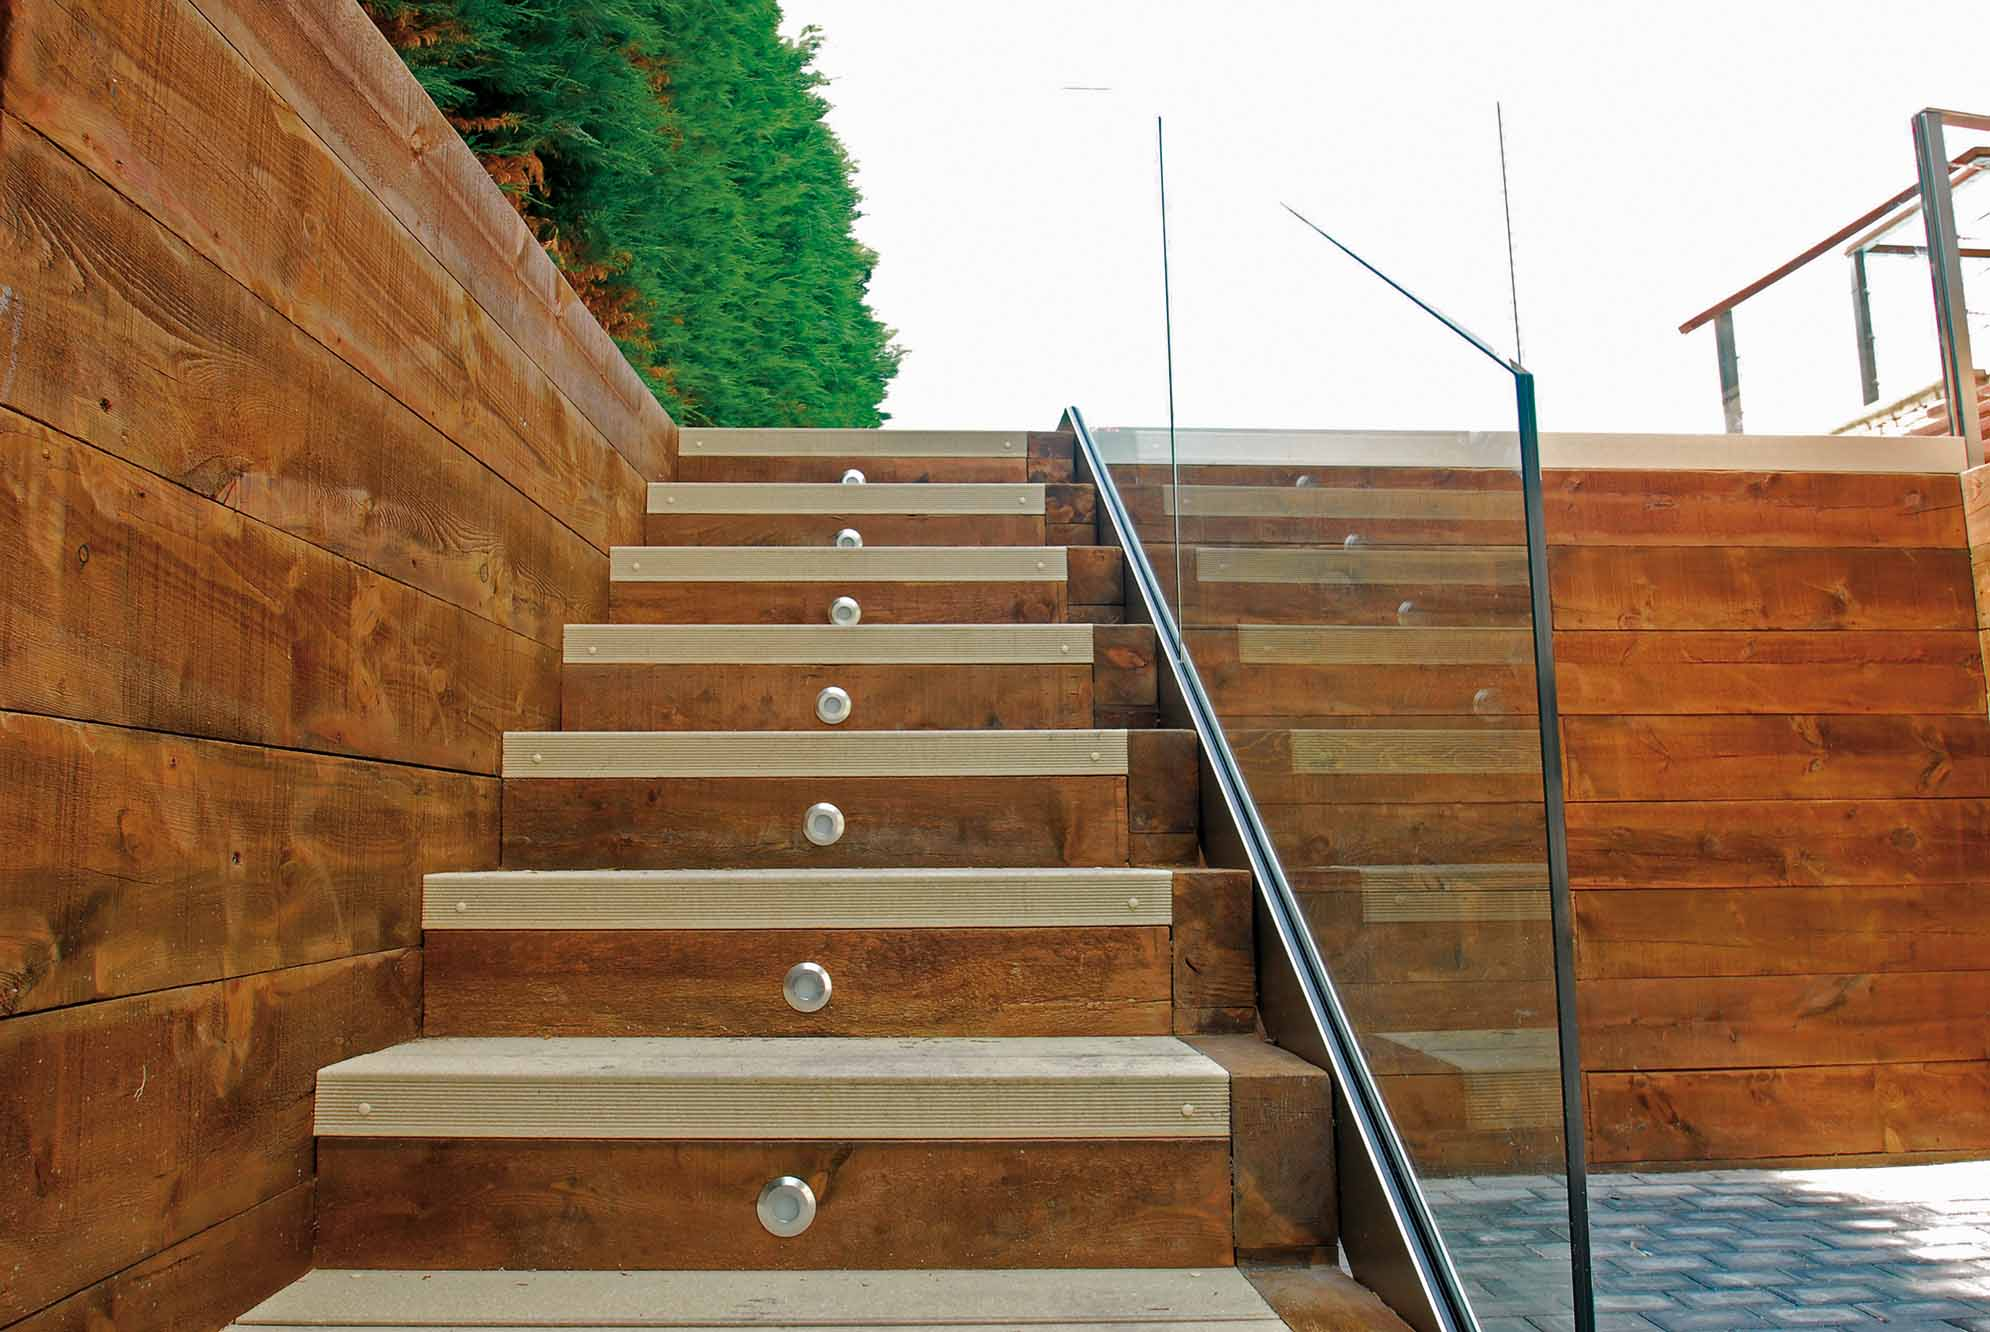 muro-contencion-traviesas-madera-6